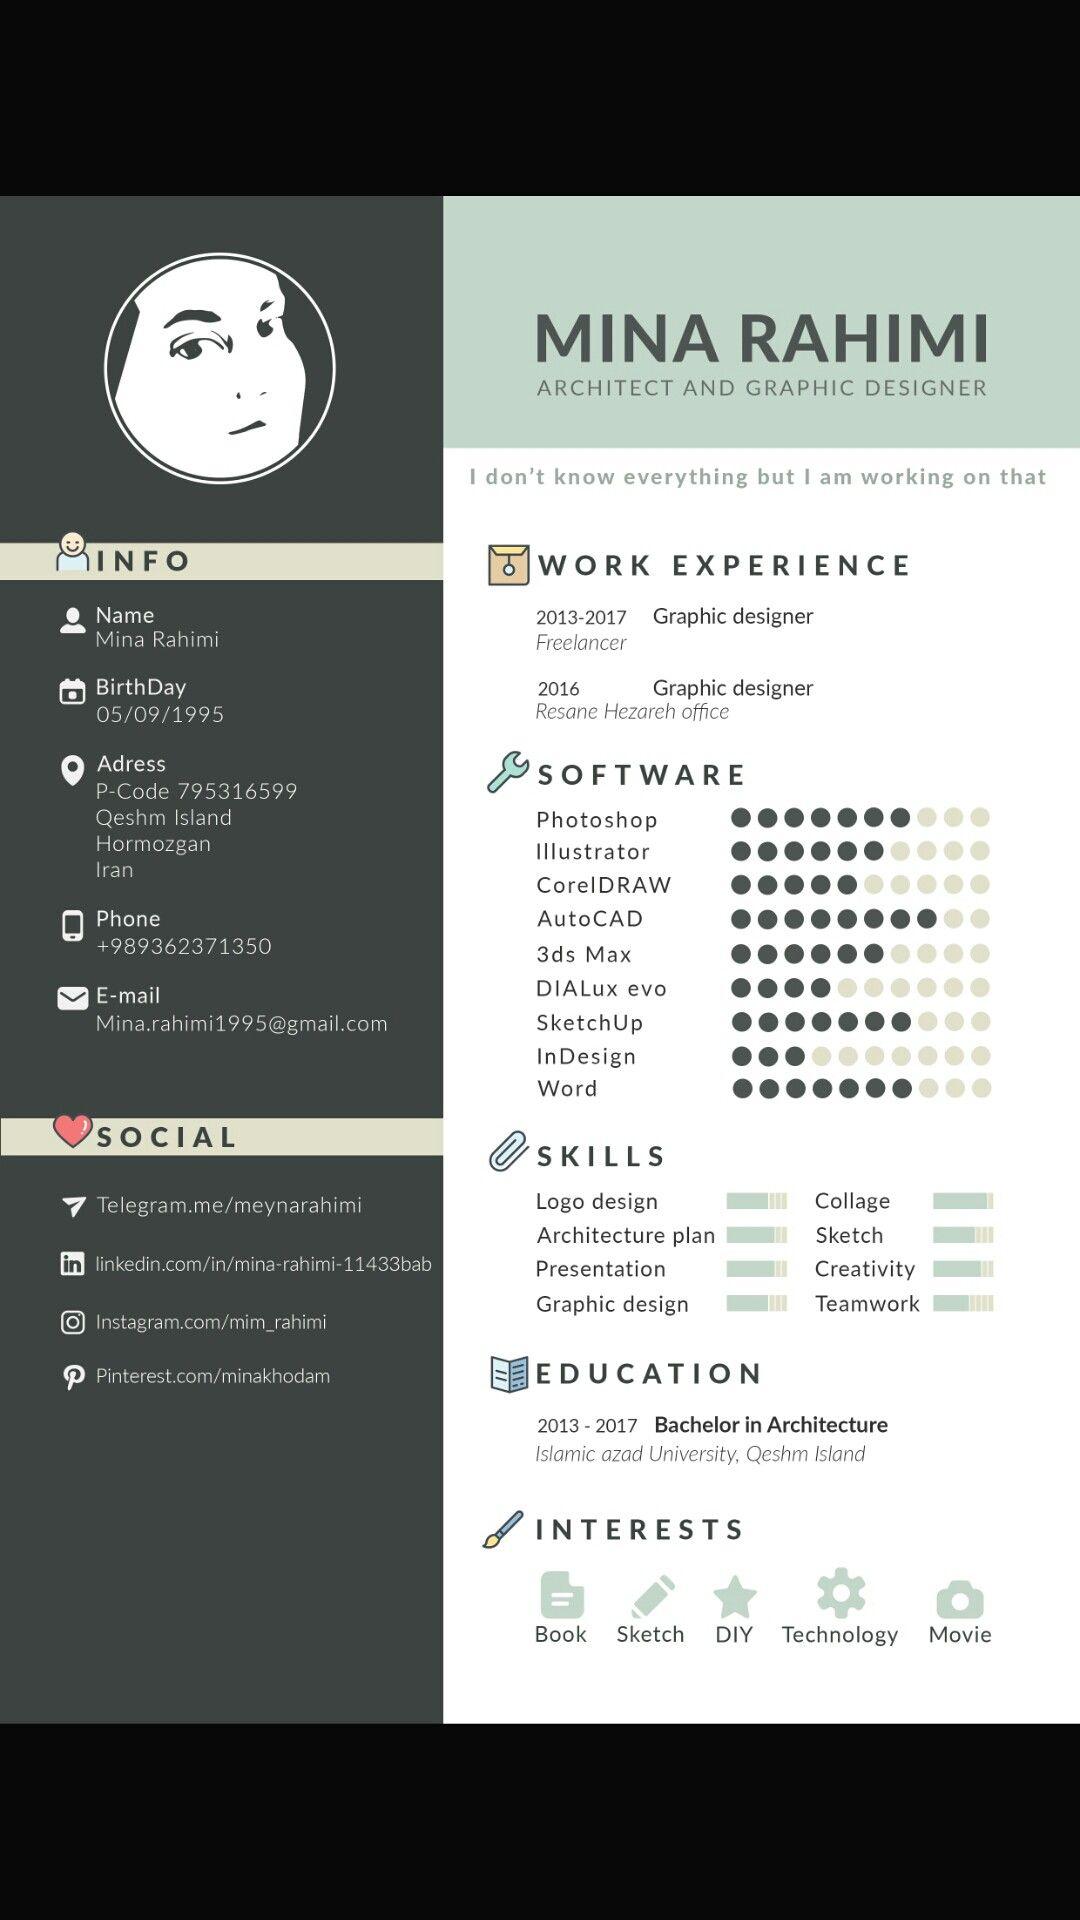 cv resume architecture art graphic design work